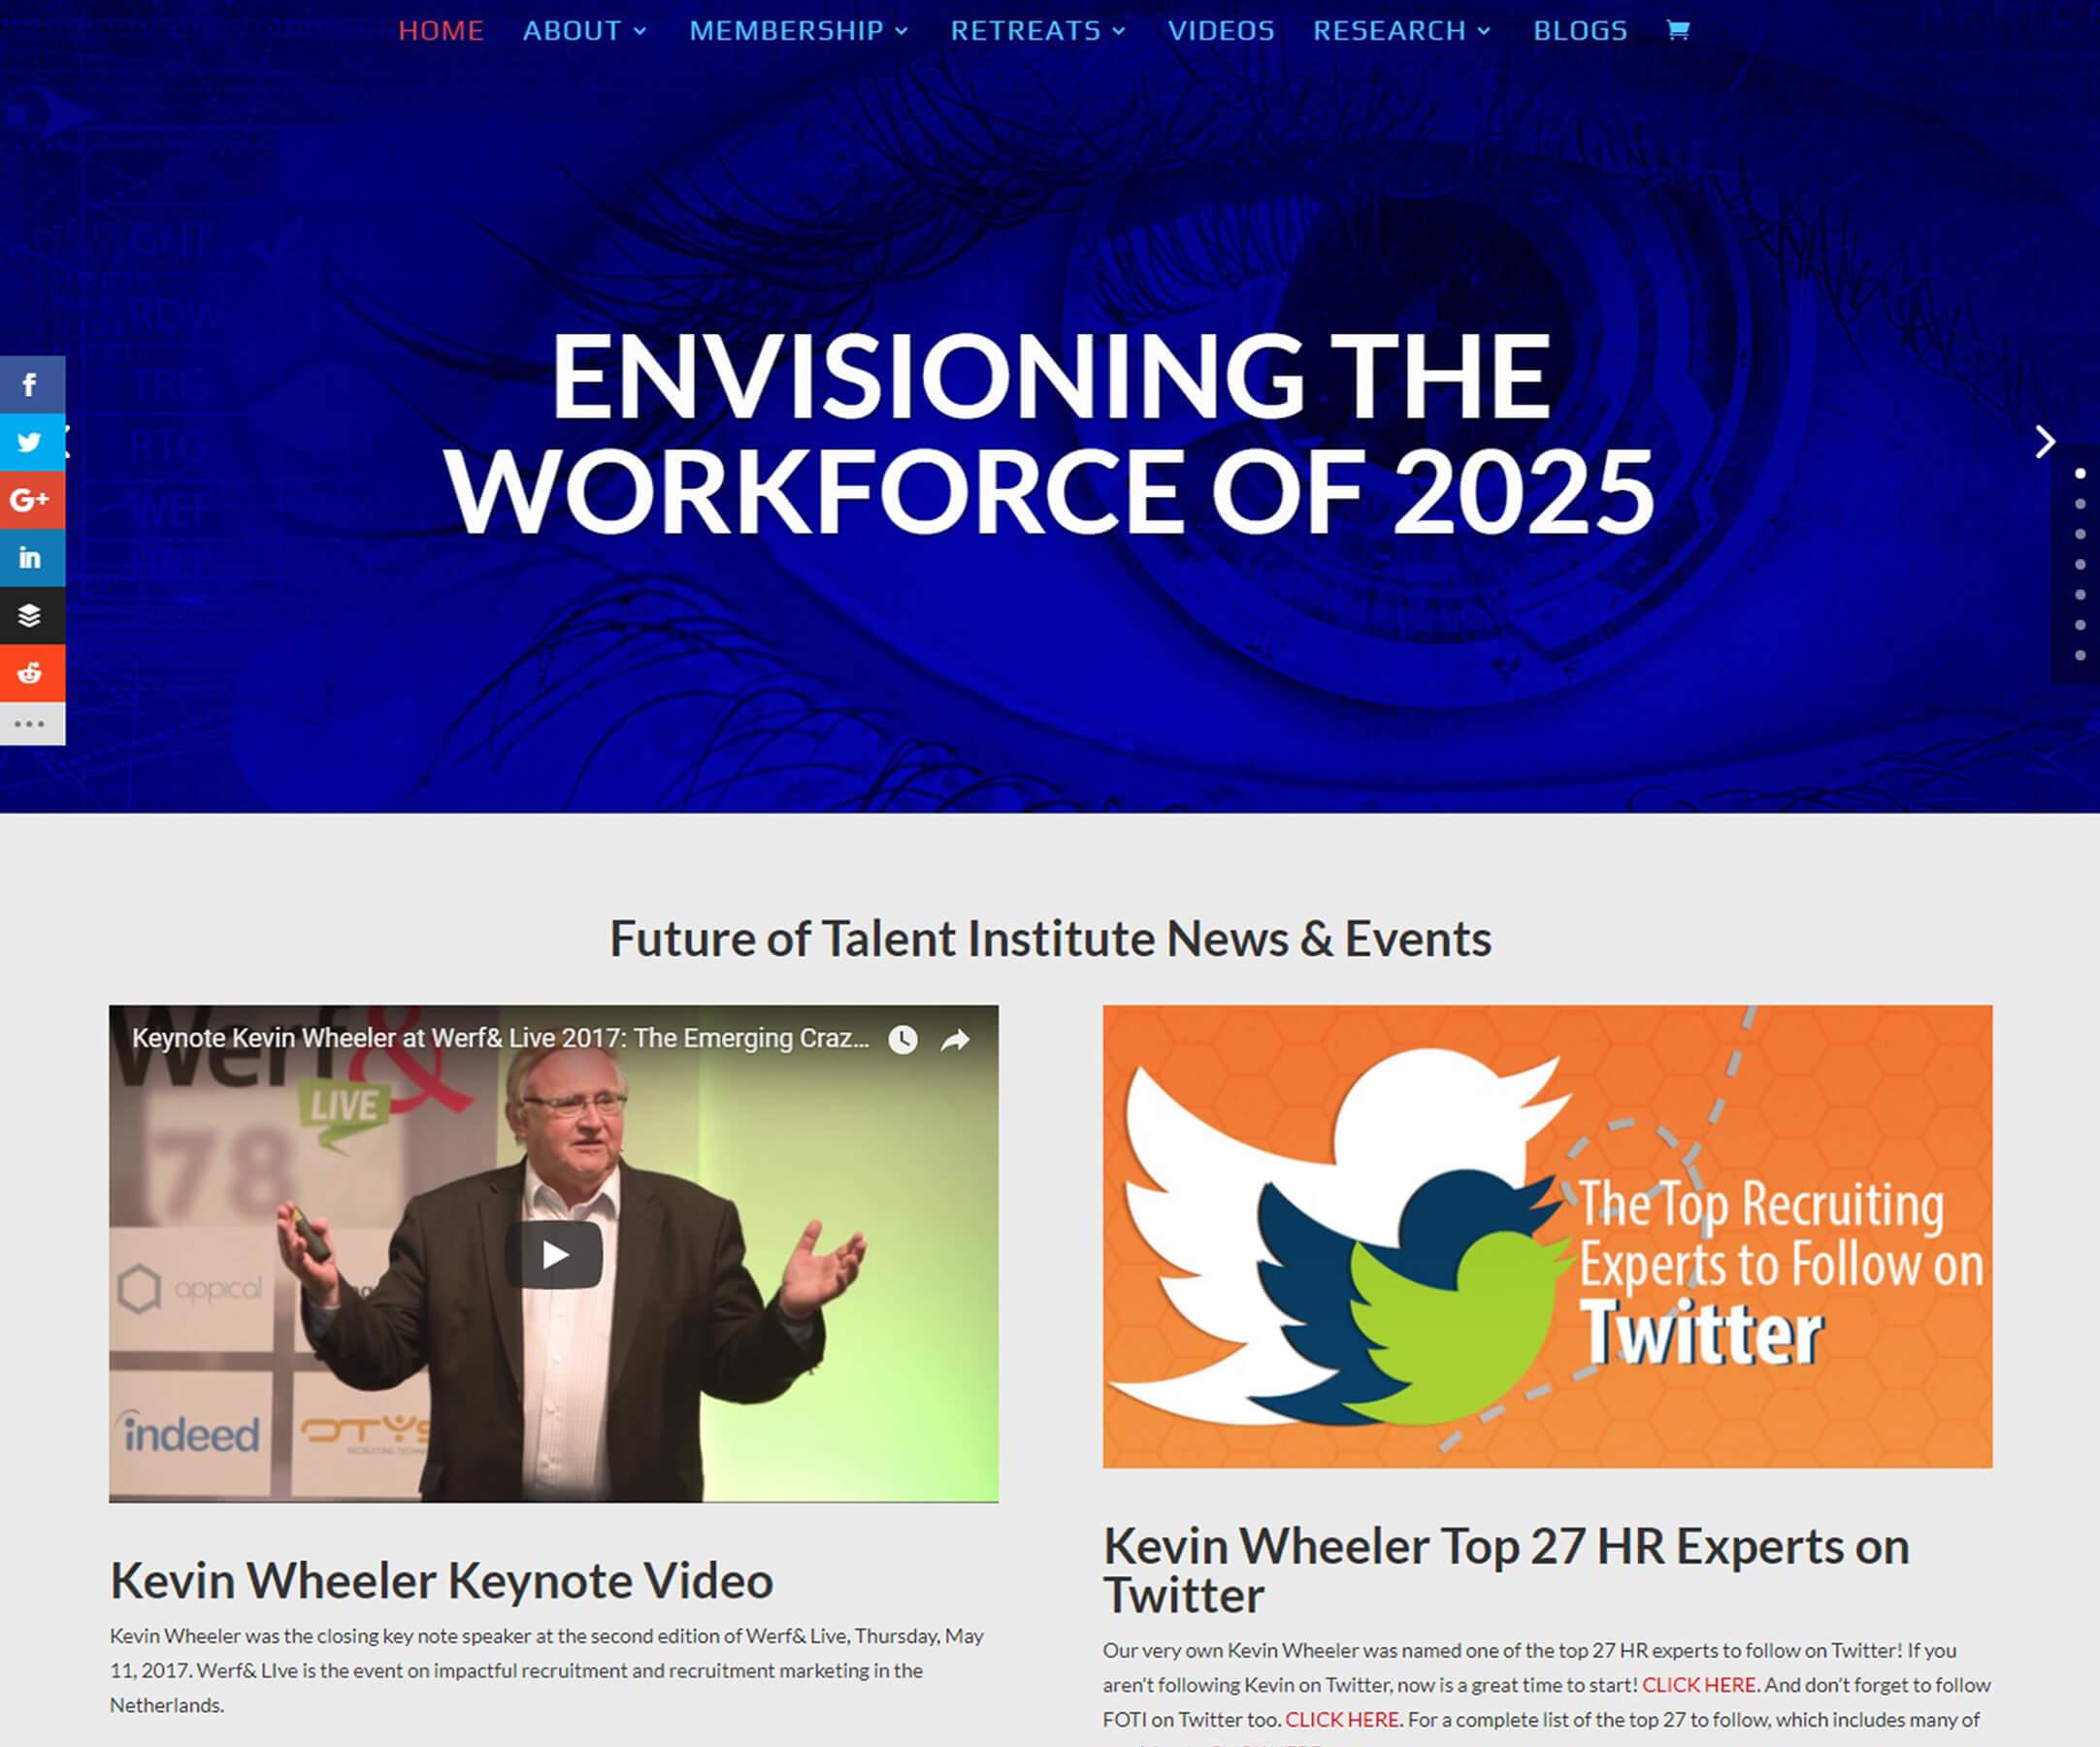 Website Design Business Websites FUTURE OF TALENT INSTITUTE - Foss Marketing Group - Sacramento web design